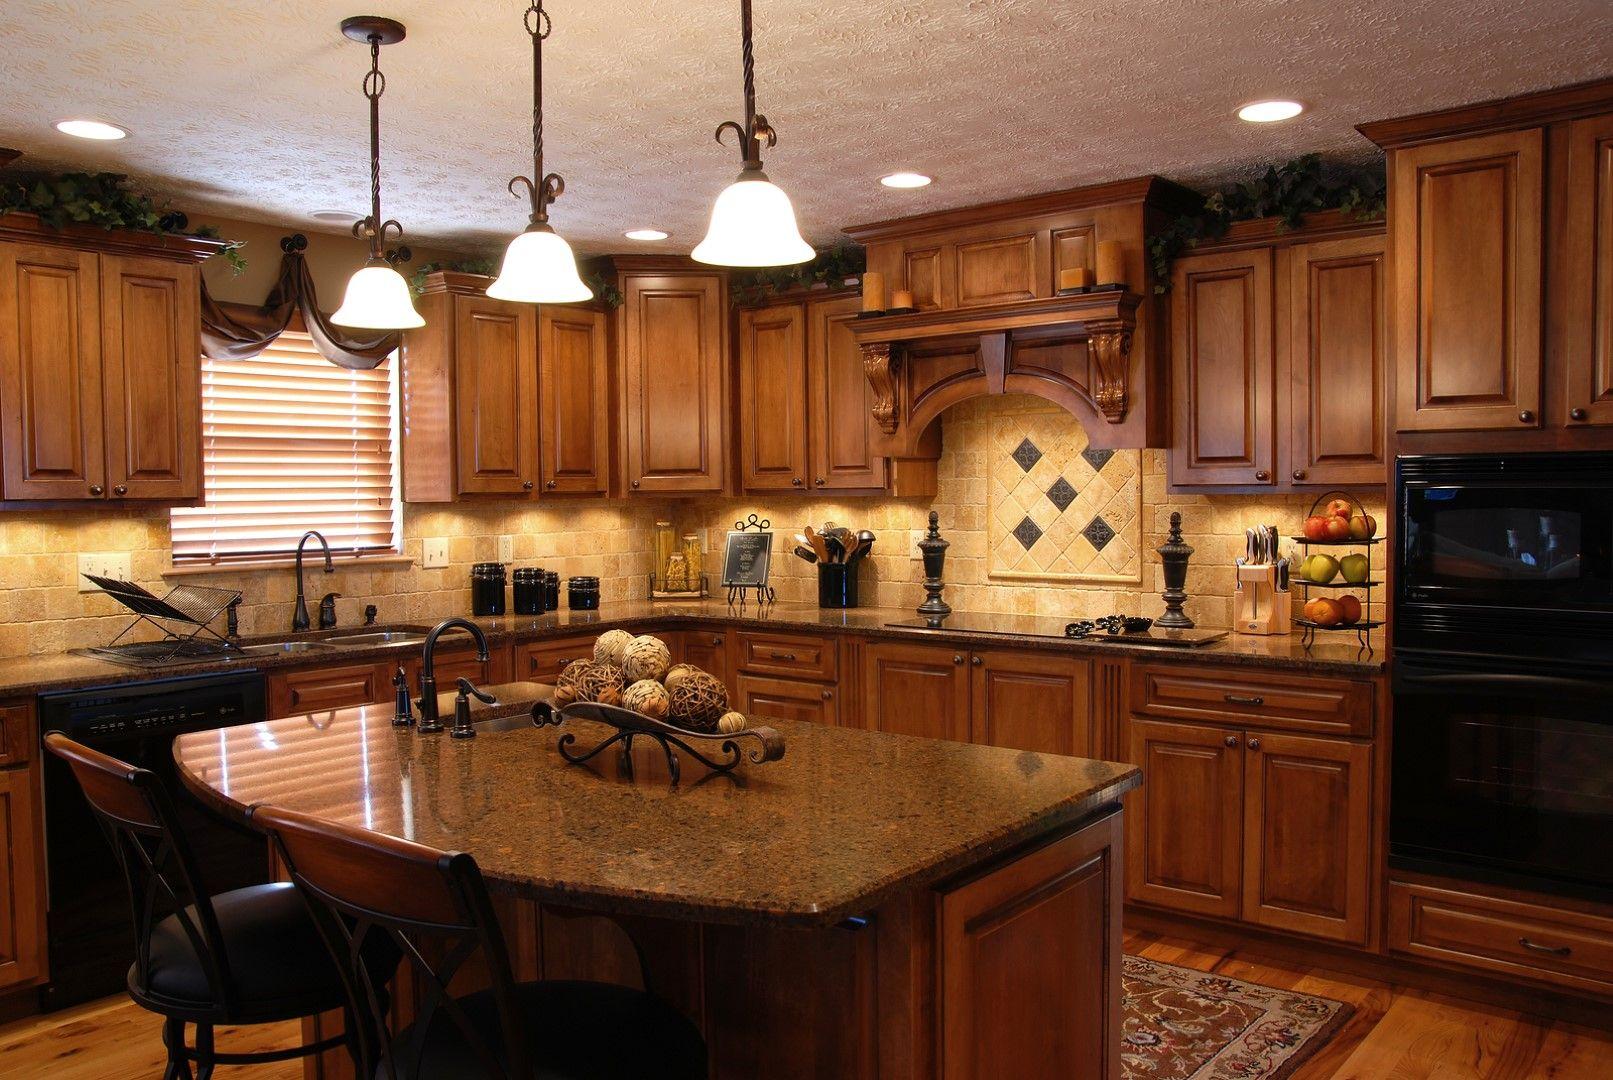 new Rimu kitchen nz - Google Search | Kitchen ideas | Pinterest